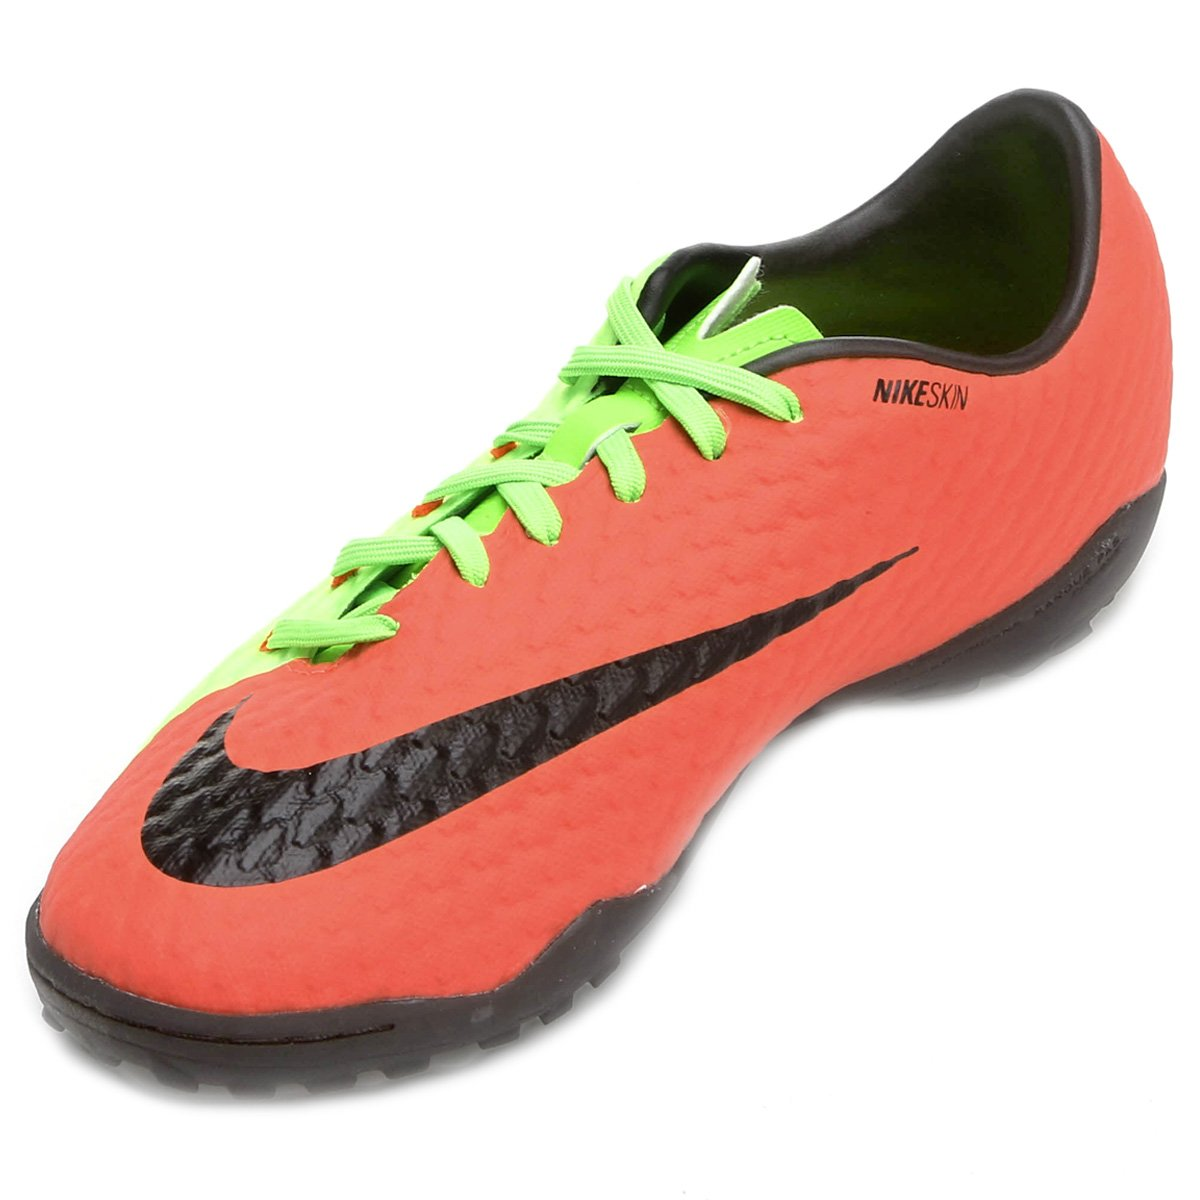 Chuteira Society Nike Hypervenom Phelon 3 TF - Compre Agora  fae3cbd7a0aa4